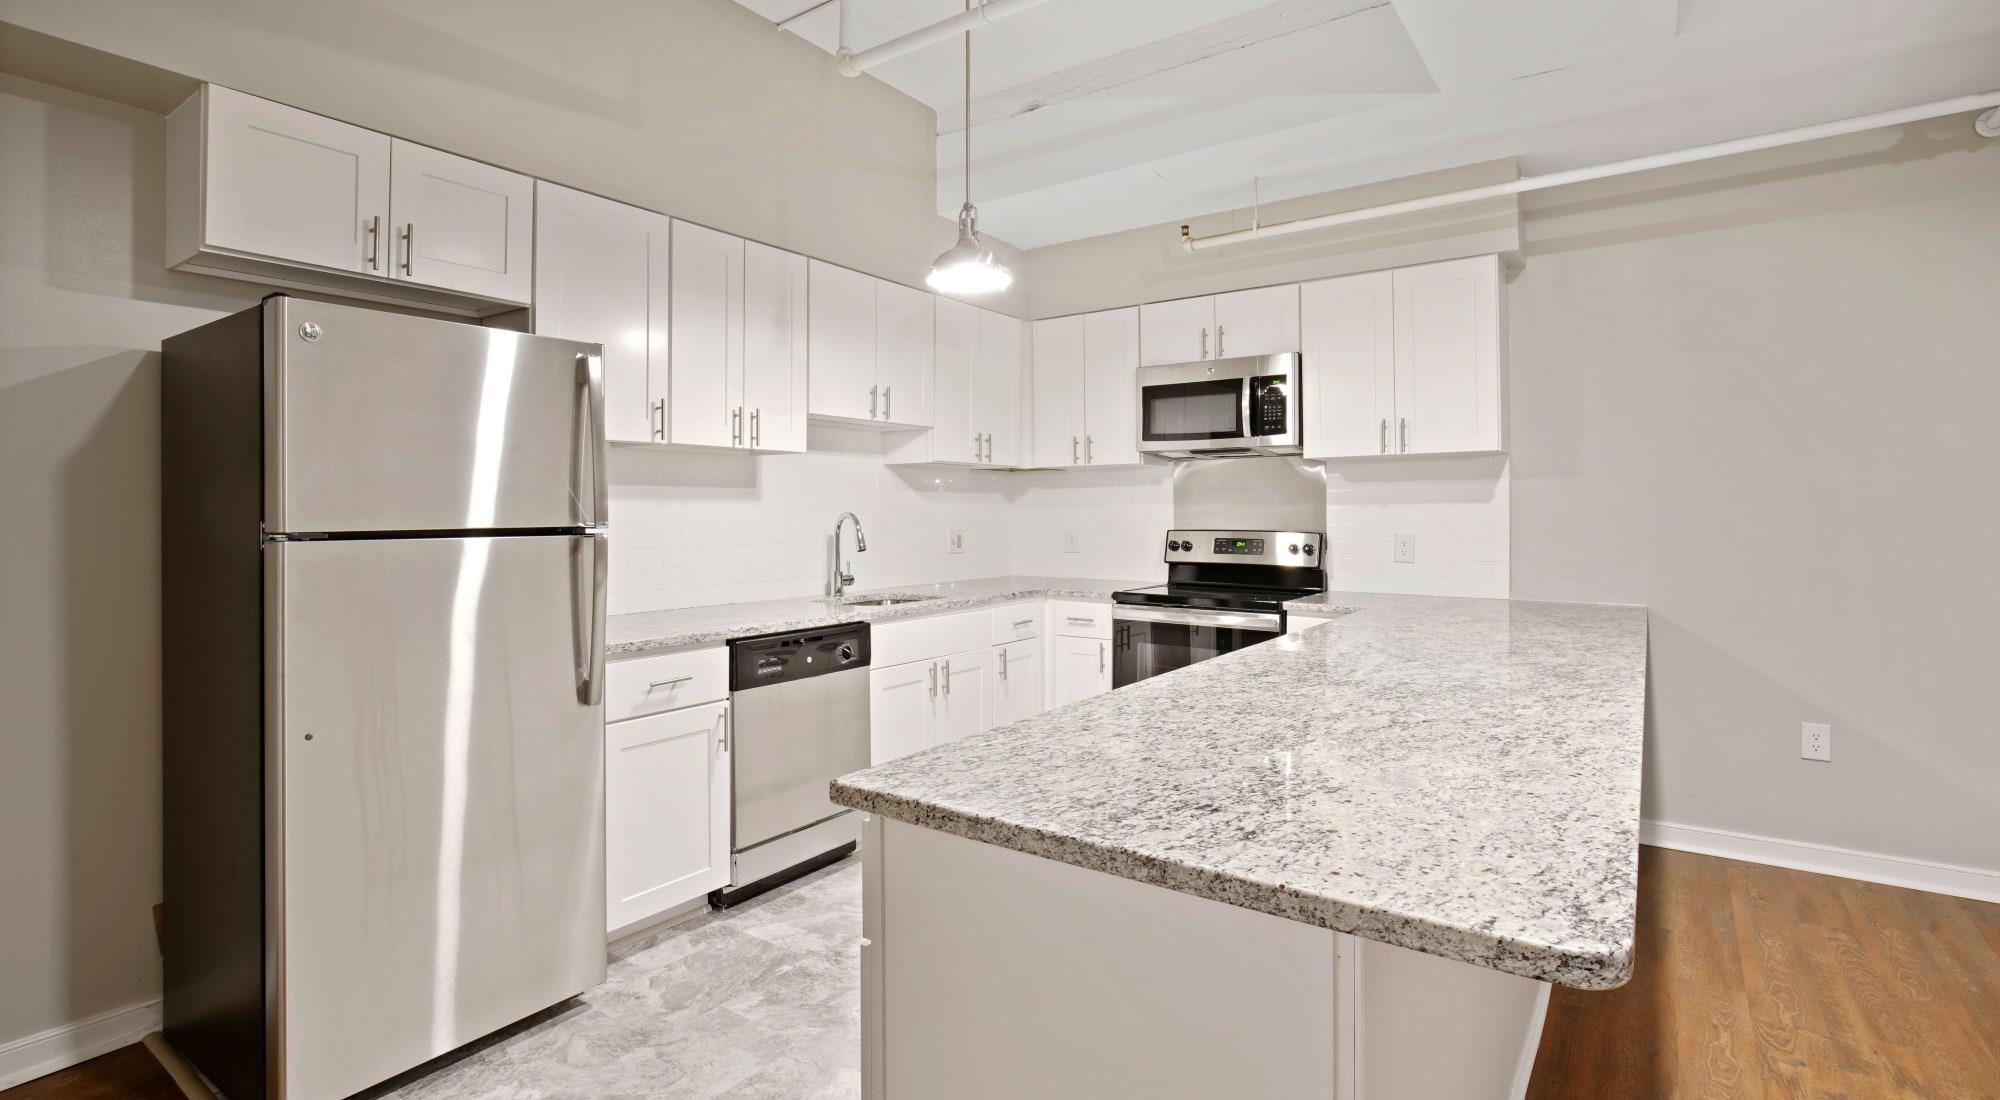 222 Saratoga apartments in Baltimore, Maryland